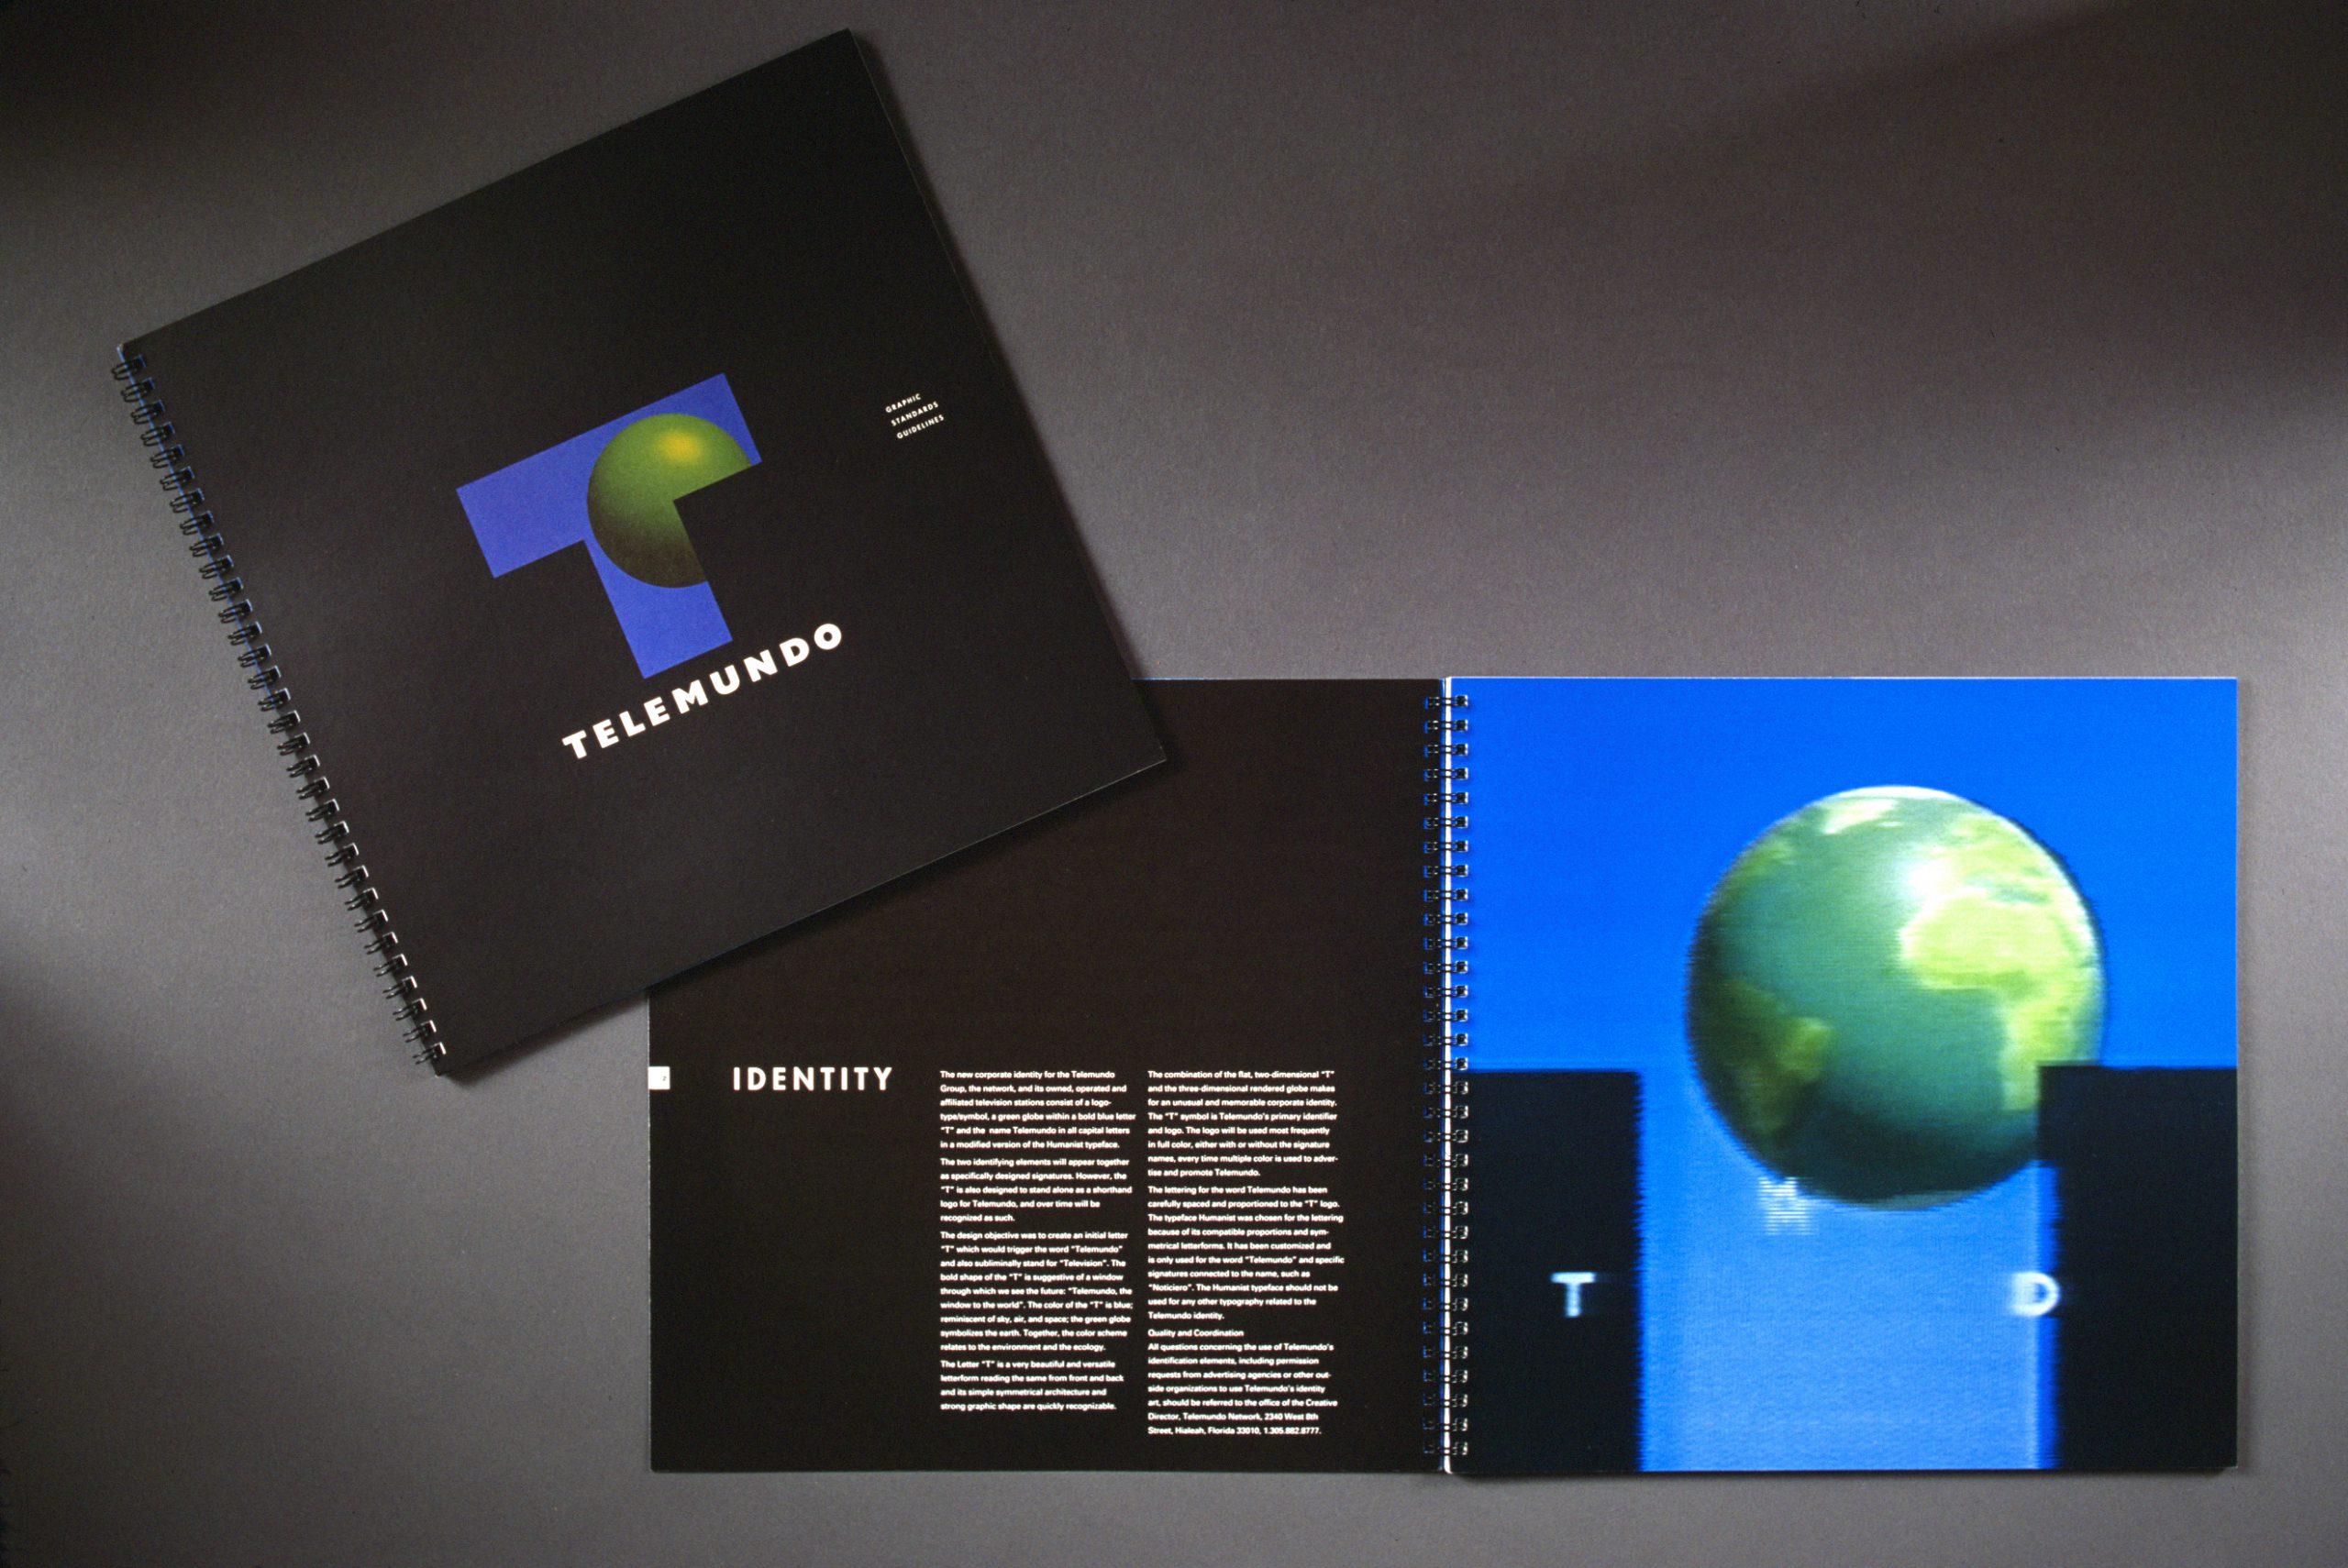 Project image 2 for Brand Identity Program, Telemundo